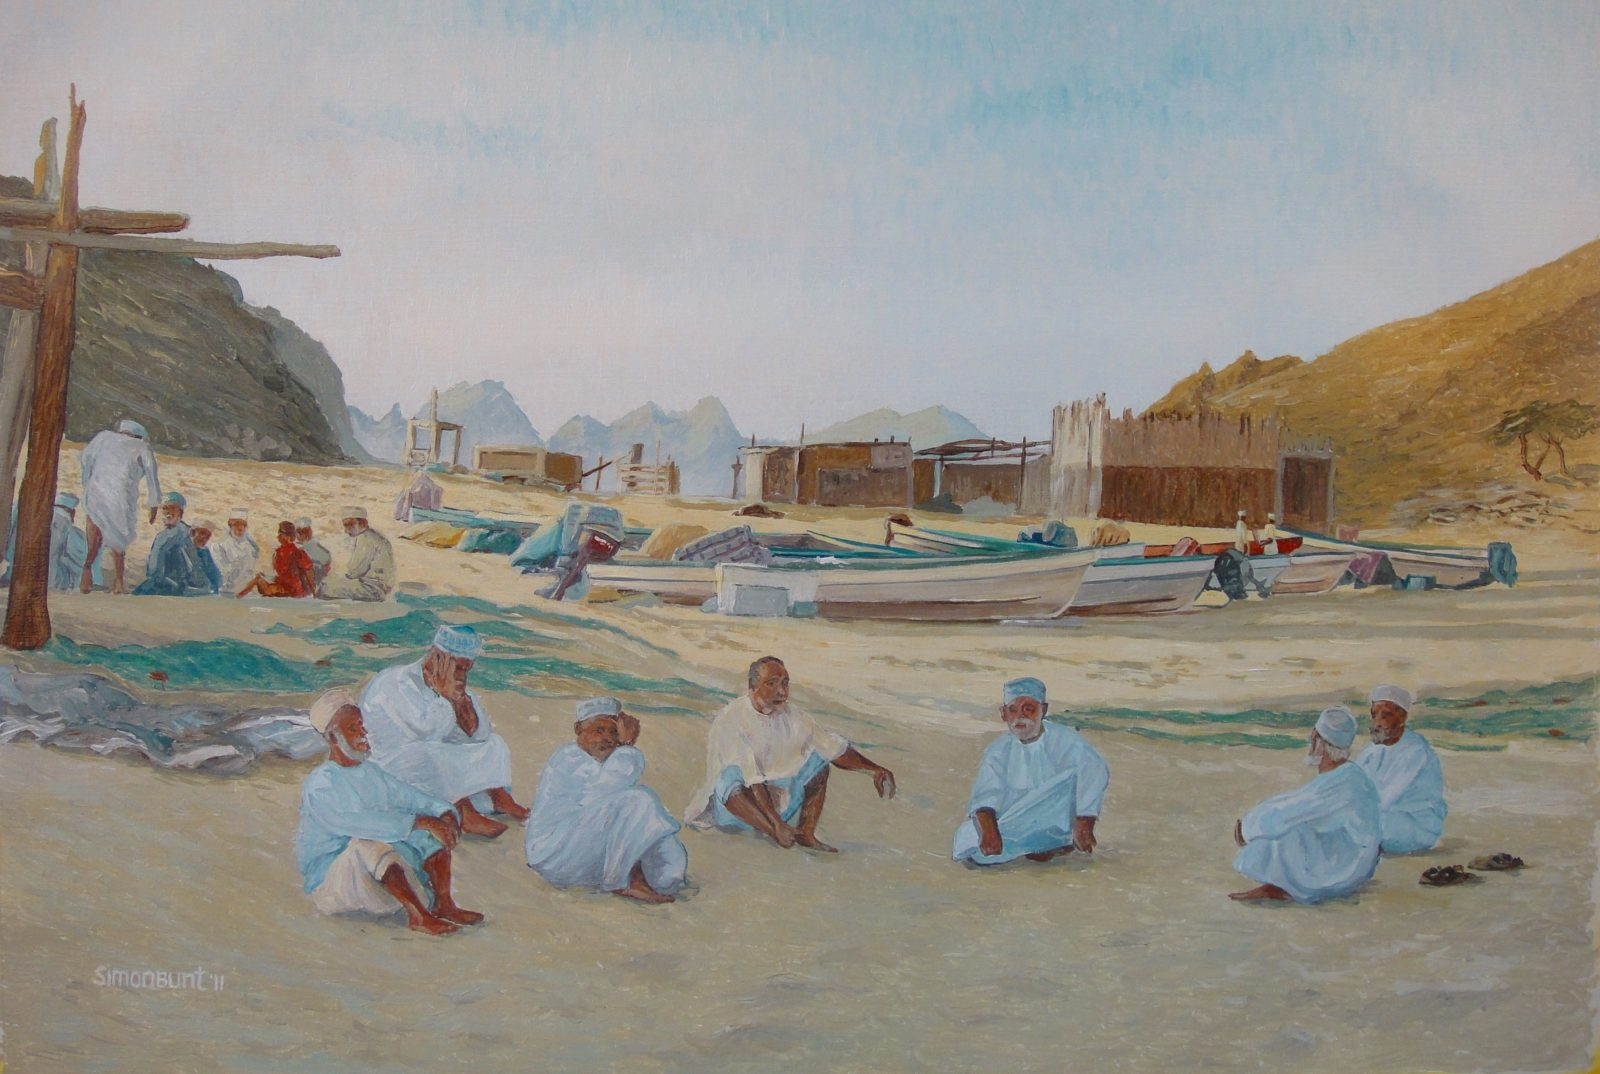 Qantab Fishermen(2) 80x55 acrylic on linnen